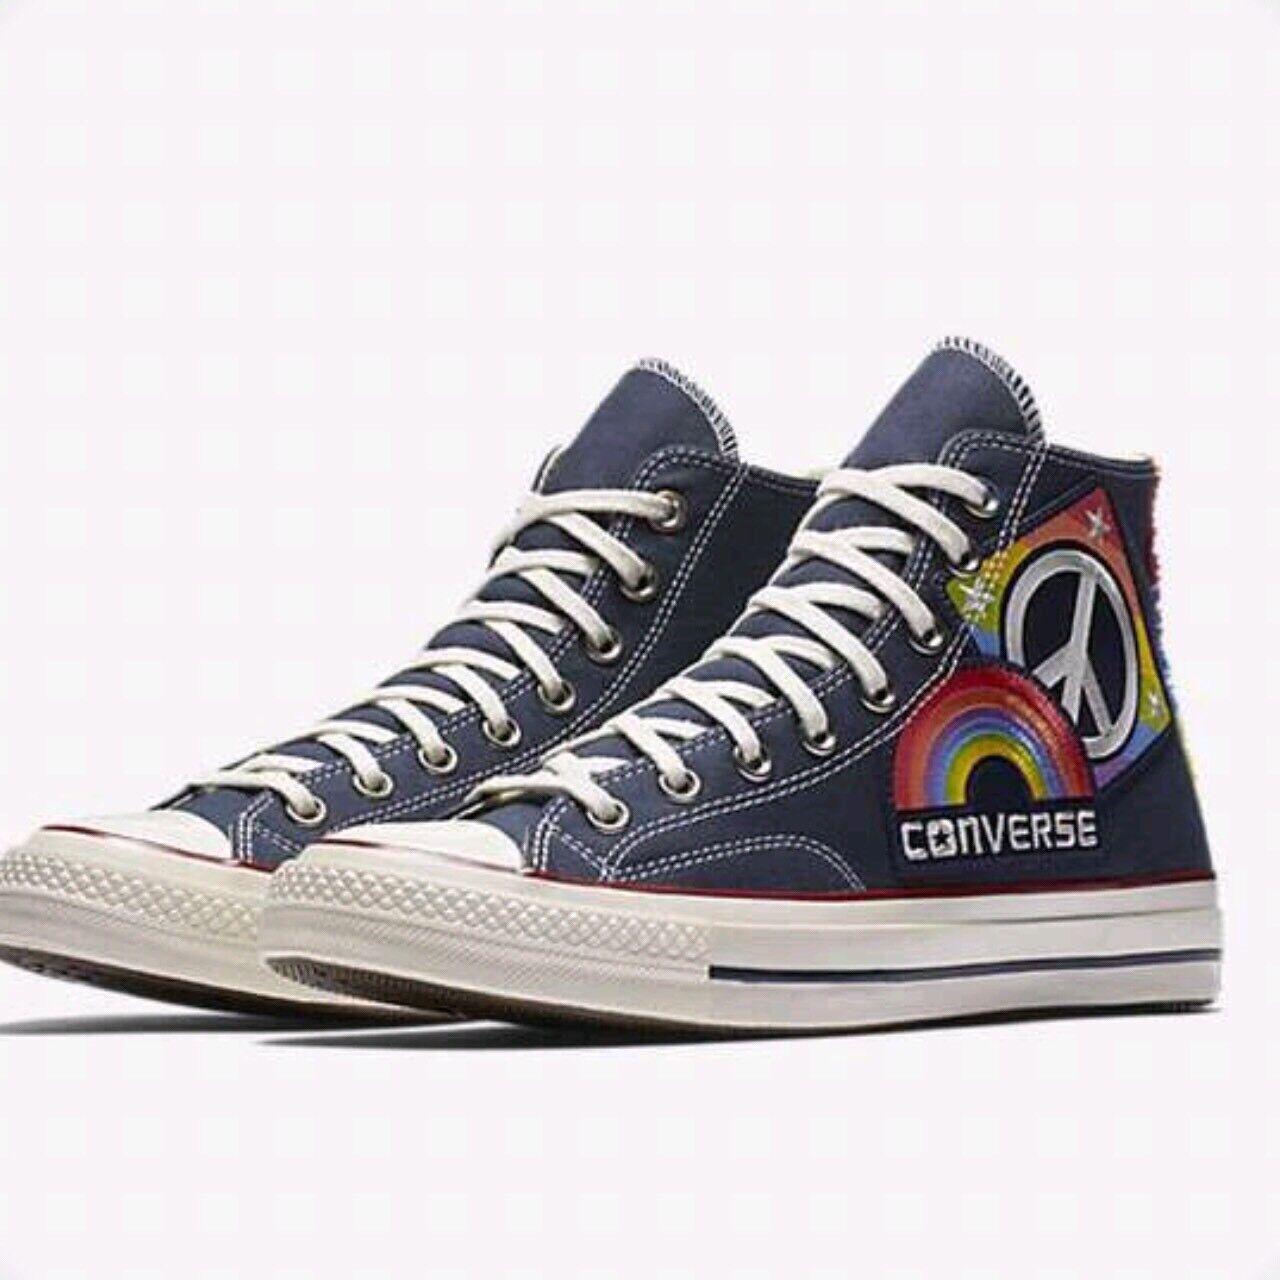 Converse Chuck Taylor All Star Hi Pride Parade HighTop bluee Rainbow Size 12